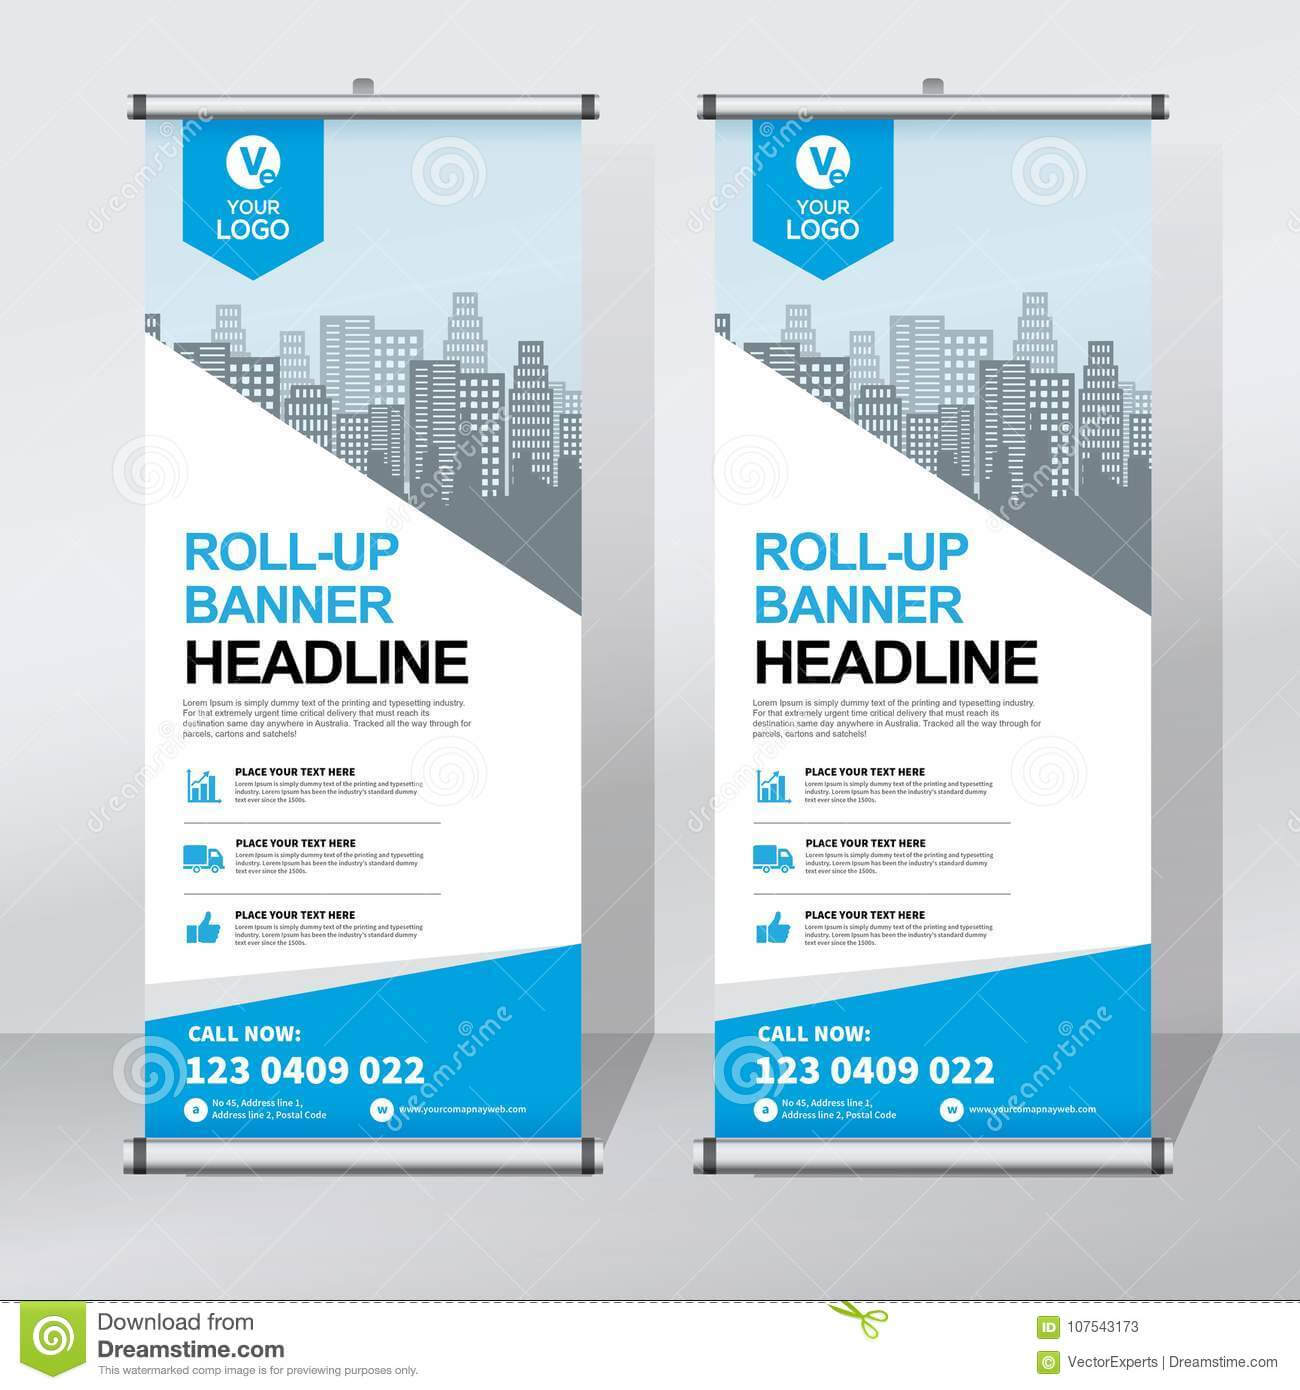 Roll Up Banner Design Template, Vertical, Abstract Intended For Retractable Banner Design Templates